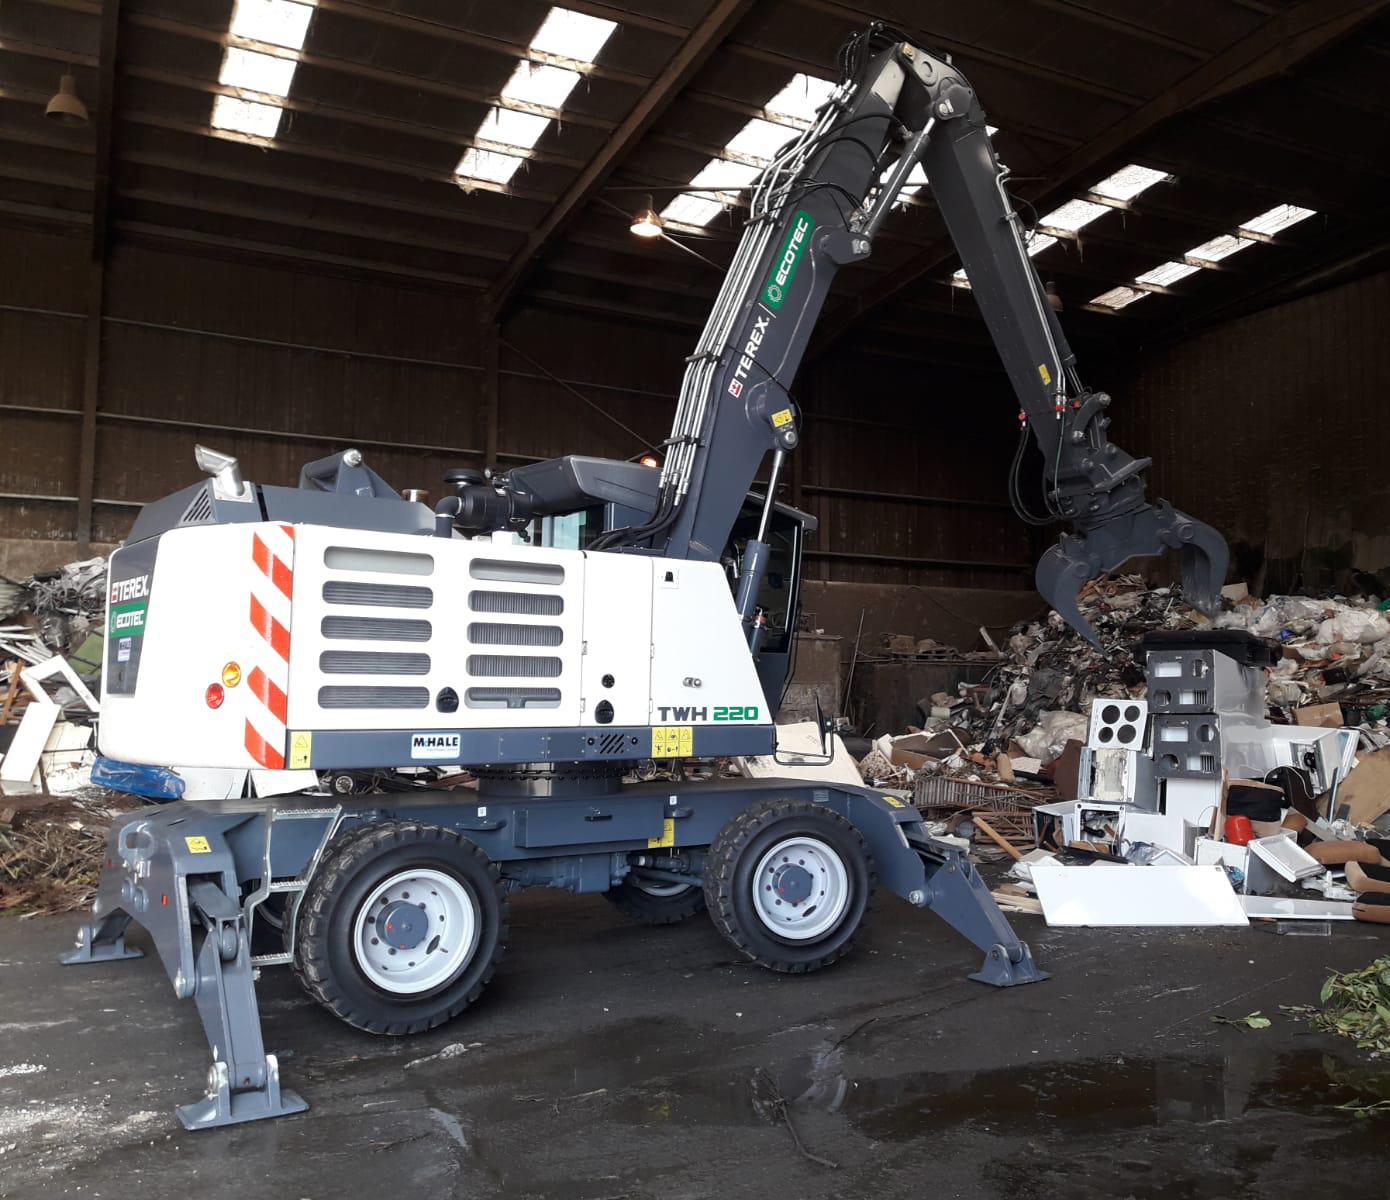 TWH220 Waste Handler on Site